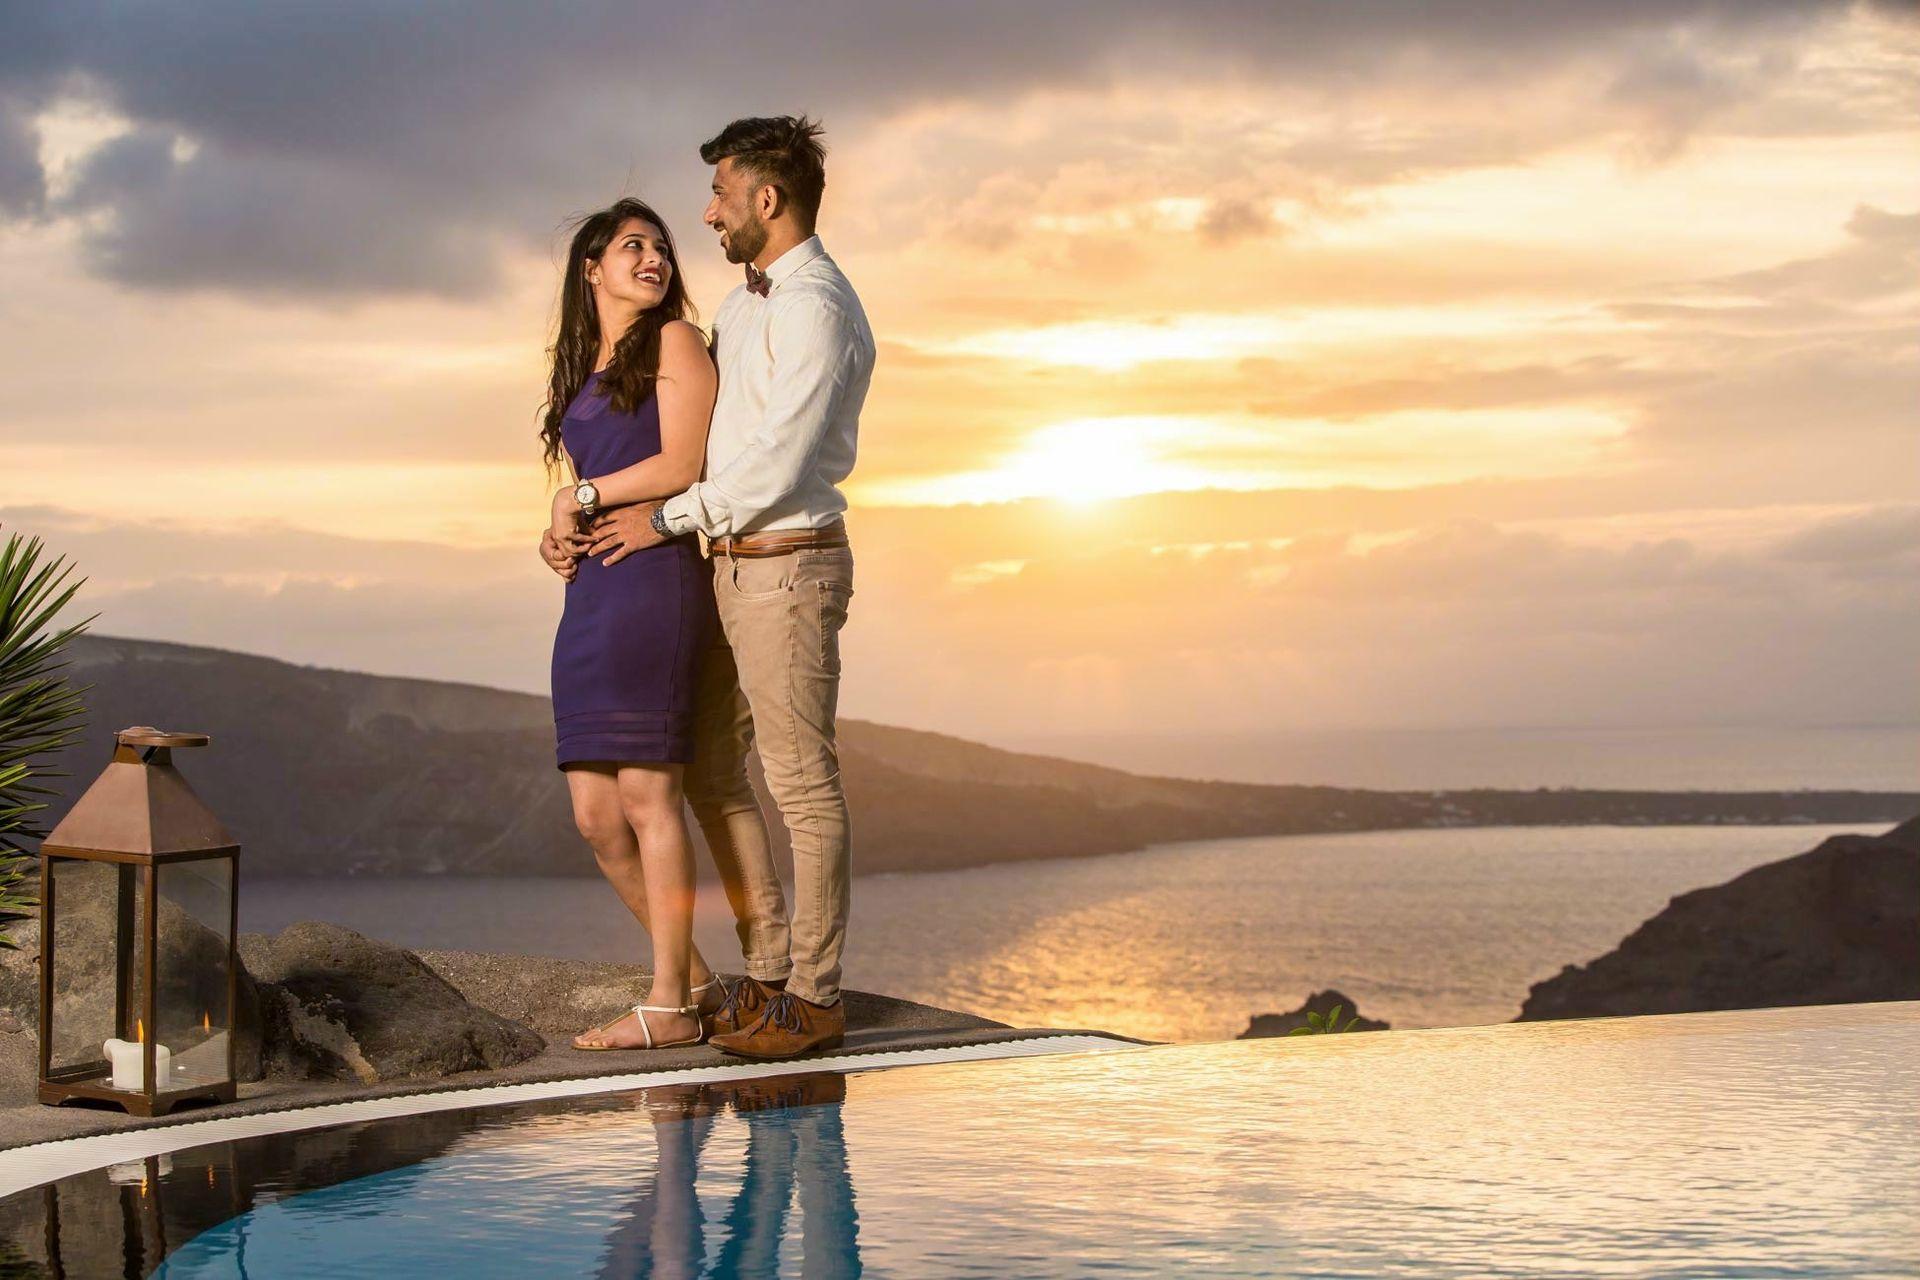 34-santorini-sunset-couple-photography-couple